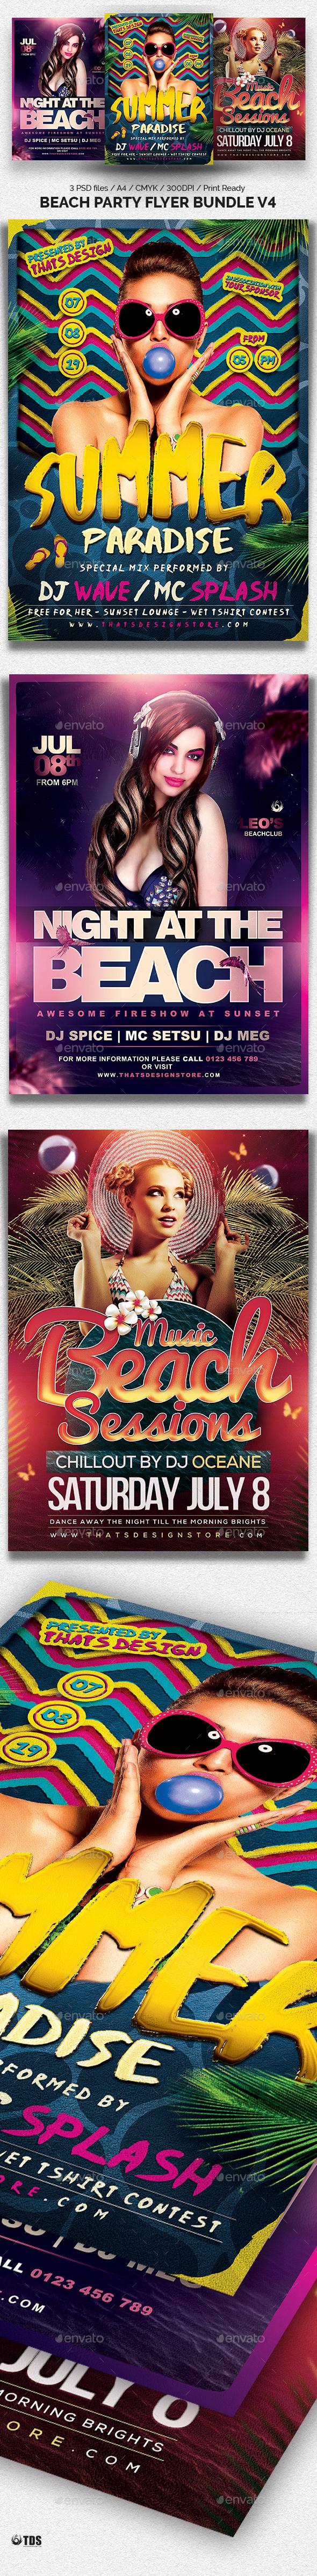 Beach Party Flyer Bundle V4 - Clubs & Parties Events